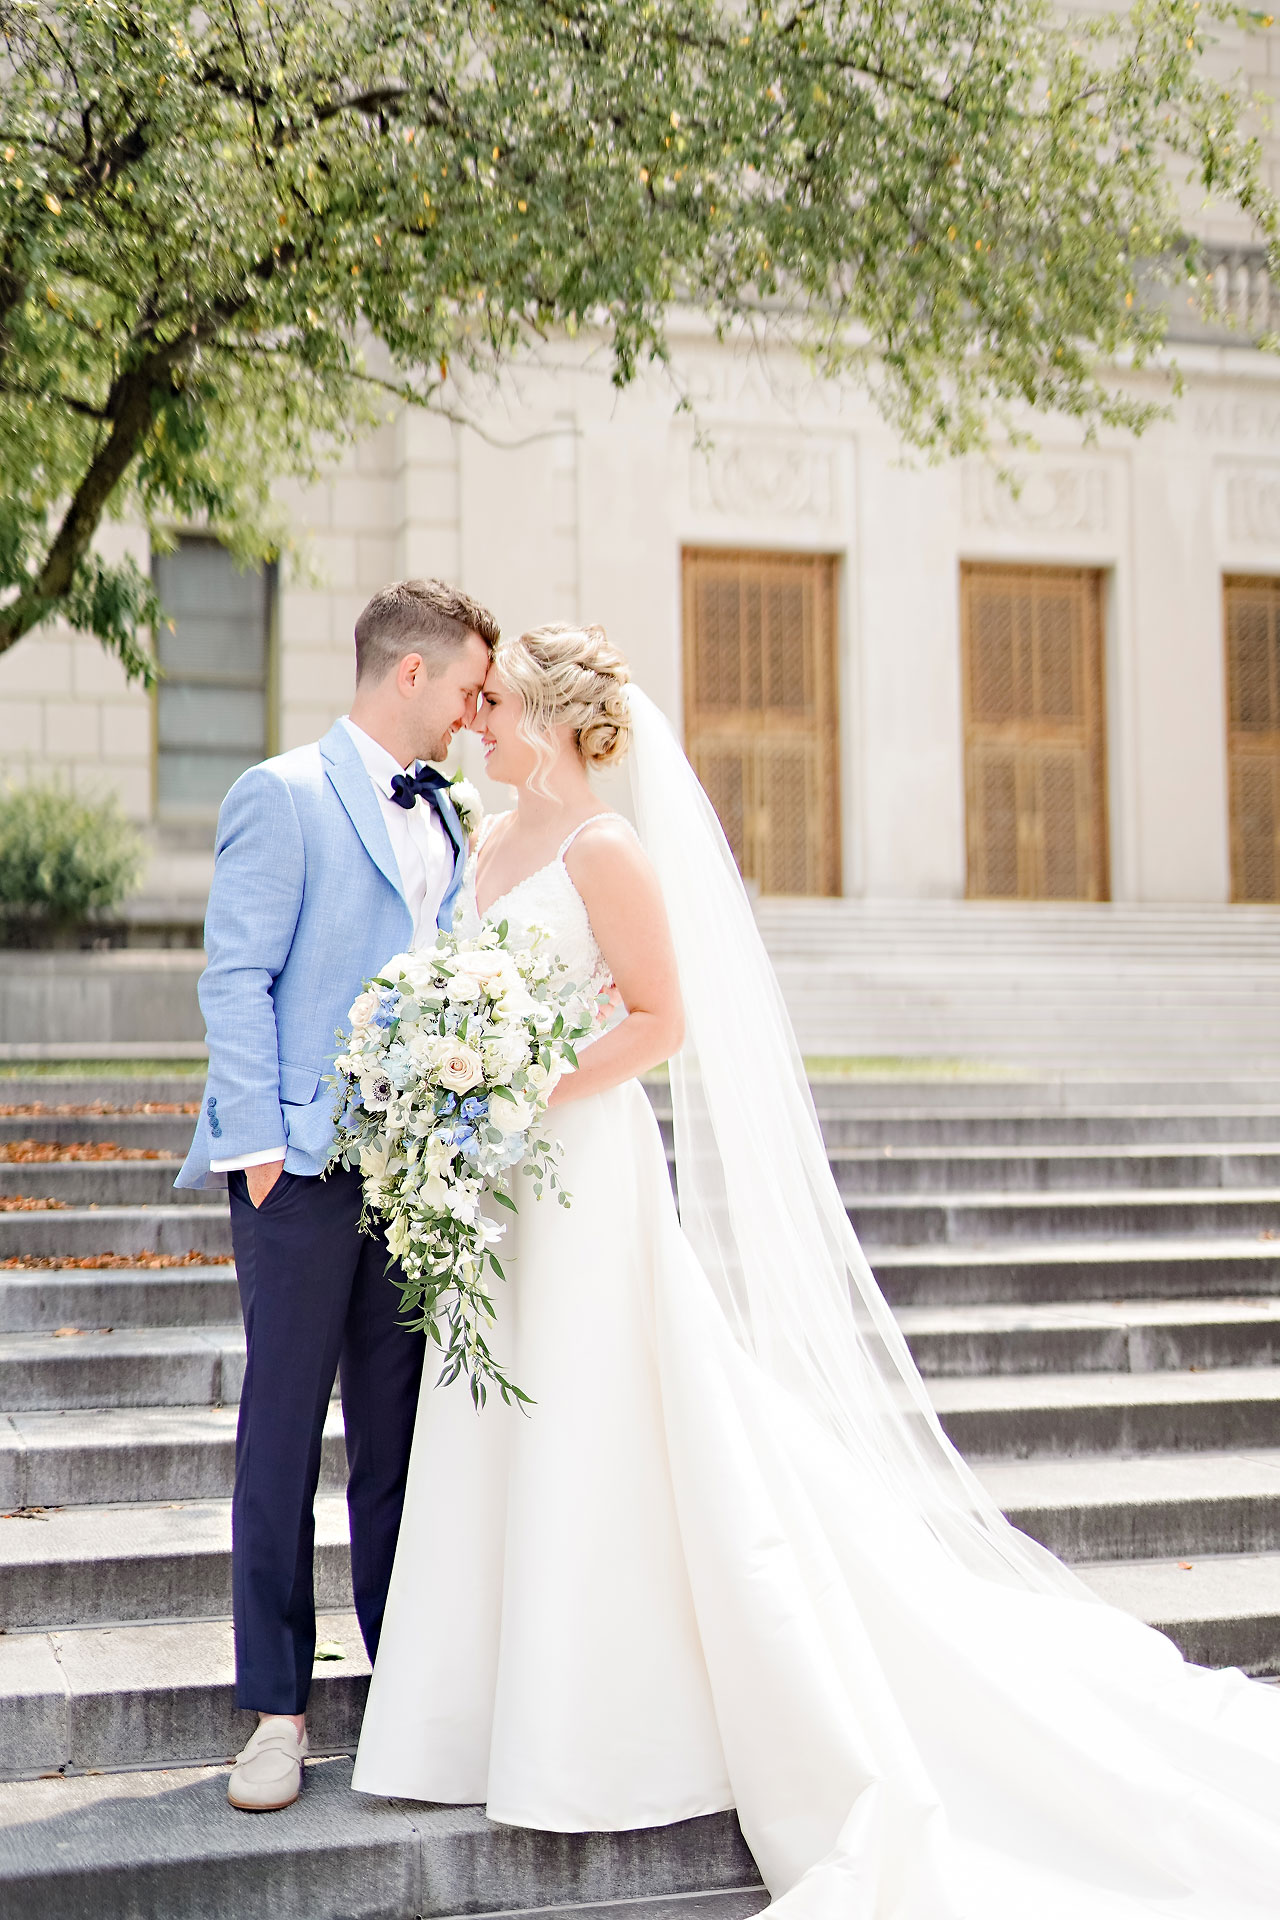 Sammi Jack Regions Tower JPS Events Indianapolis Wedding 070